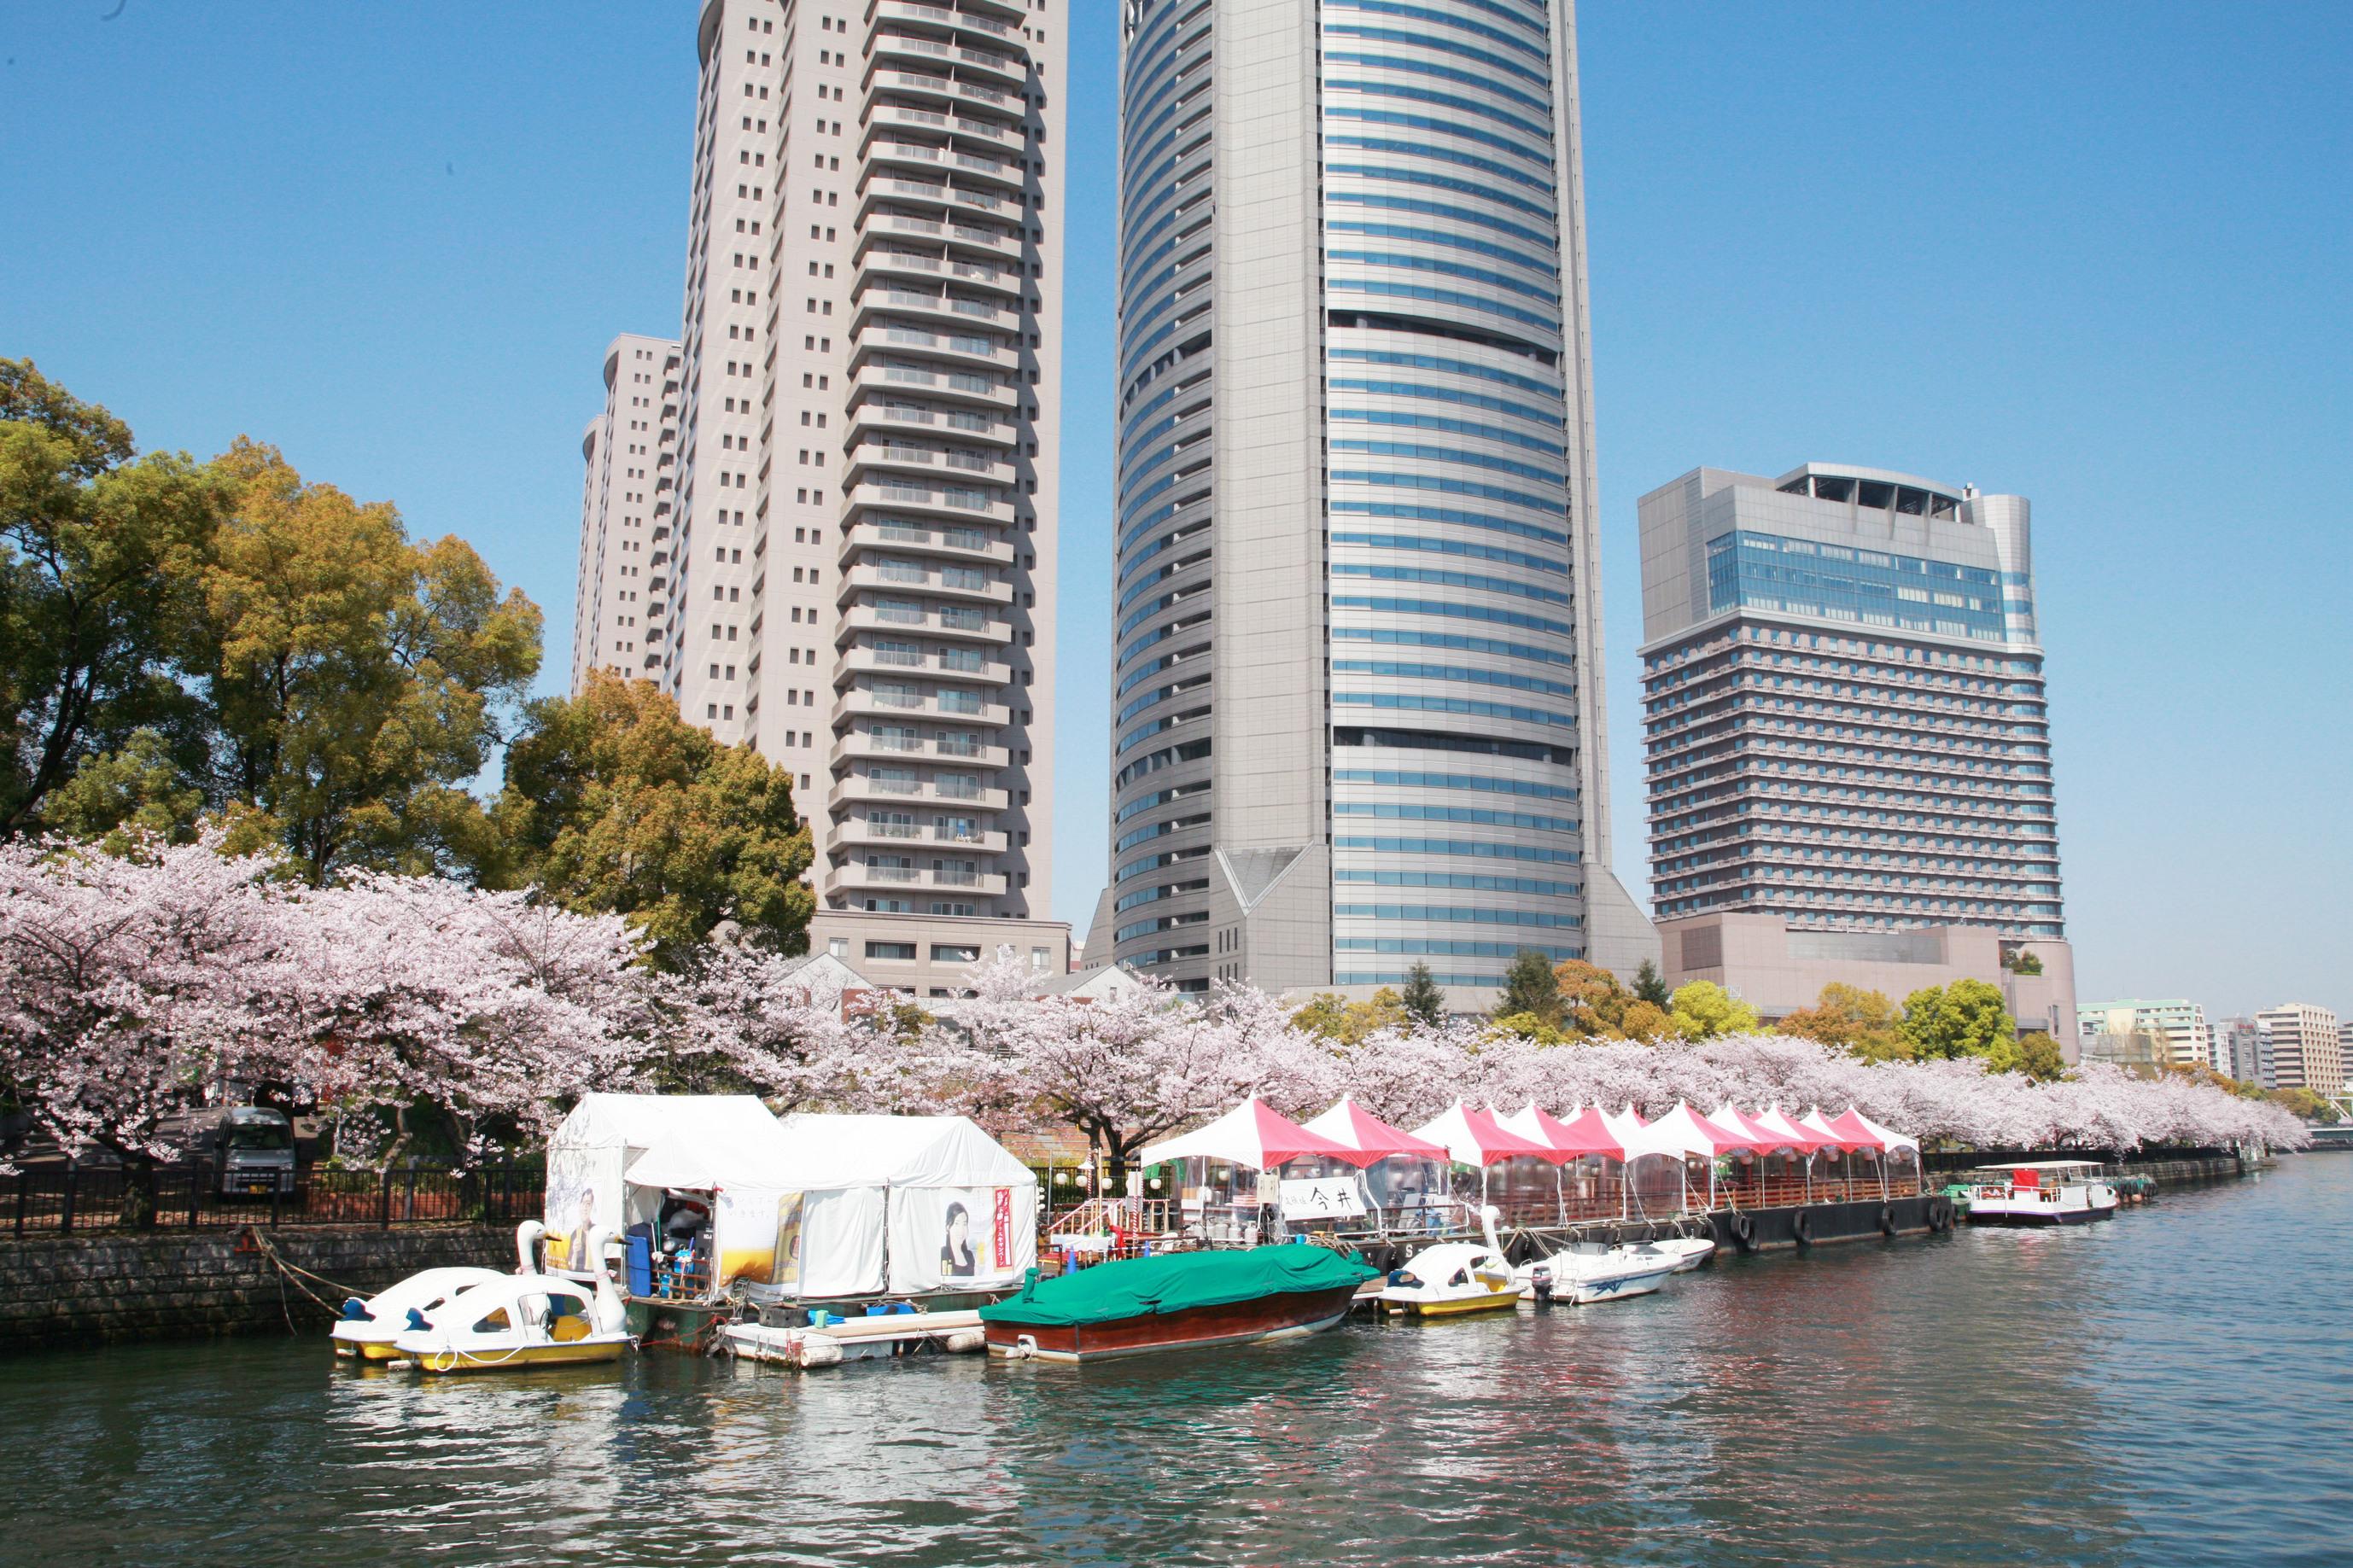 OAP Port is one of Osaka's four main water bus transit ports. OSAKA CONVENTION & TOURISM BUREAU